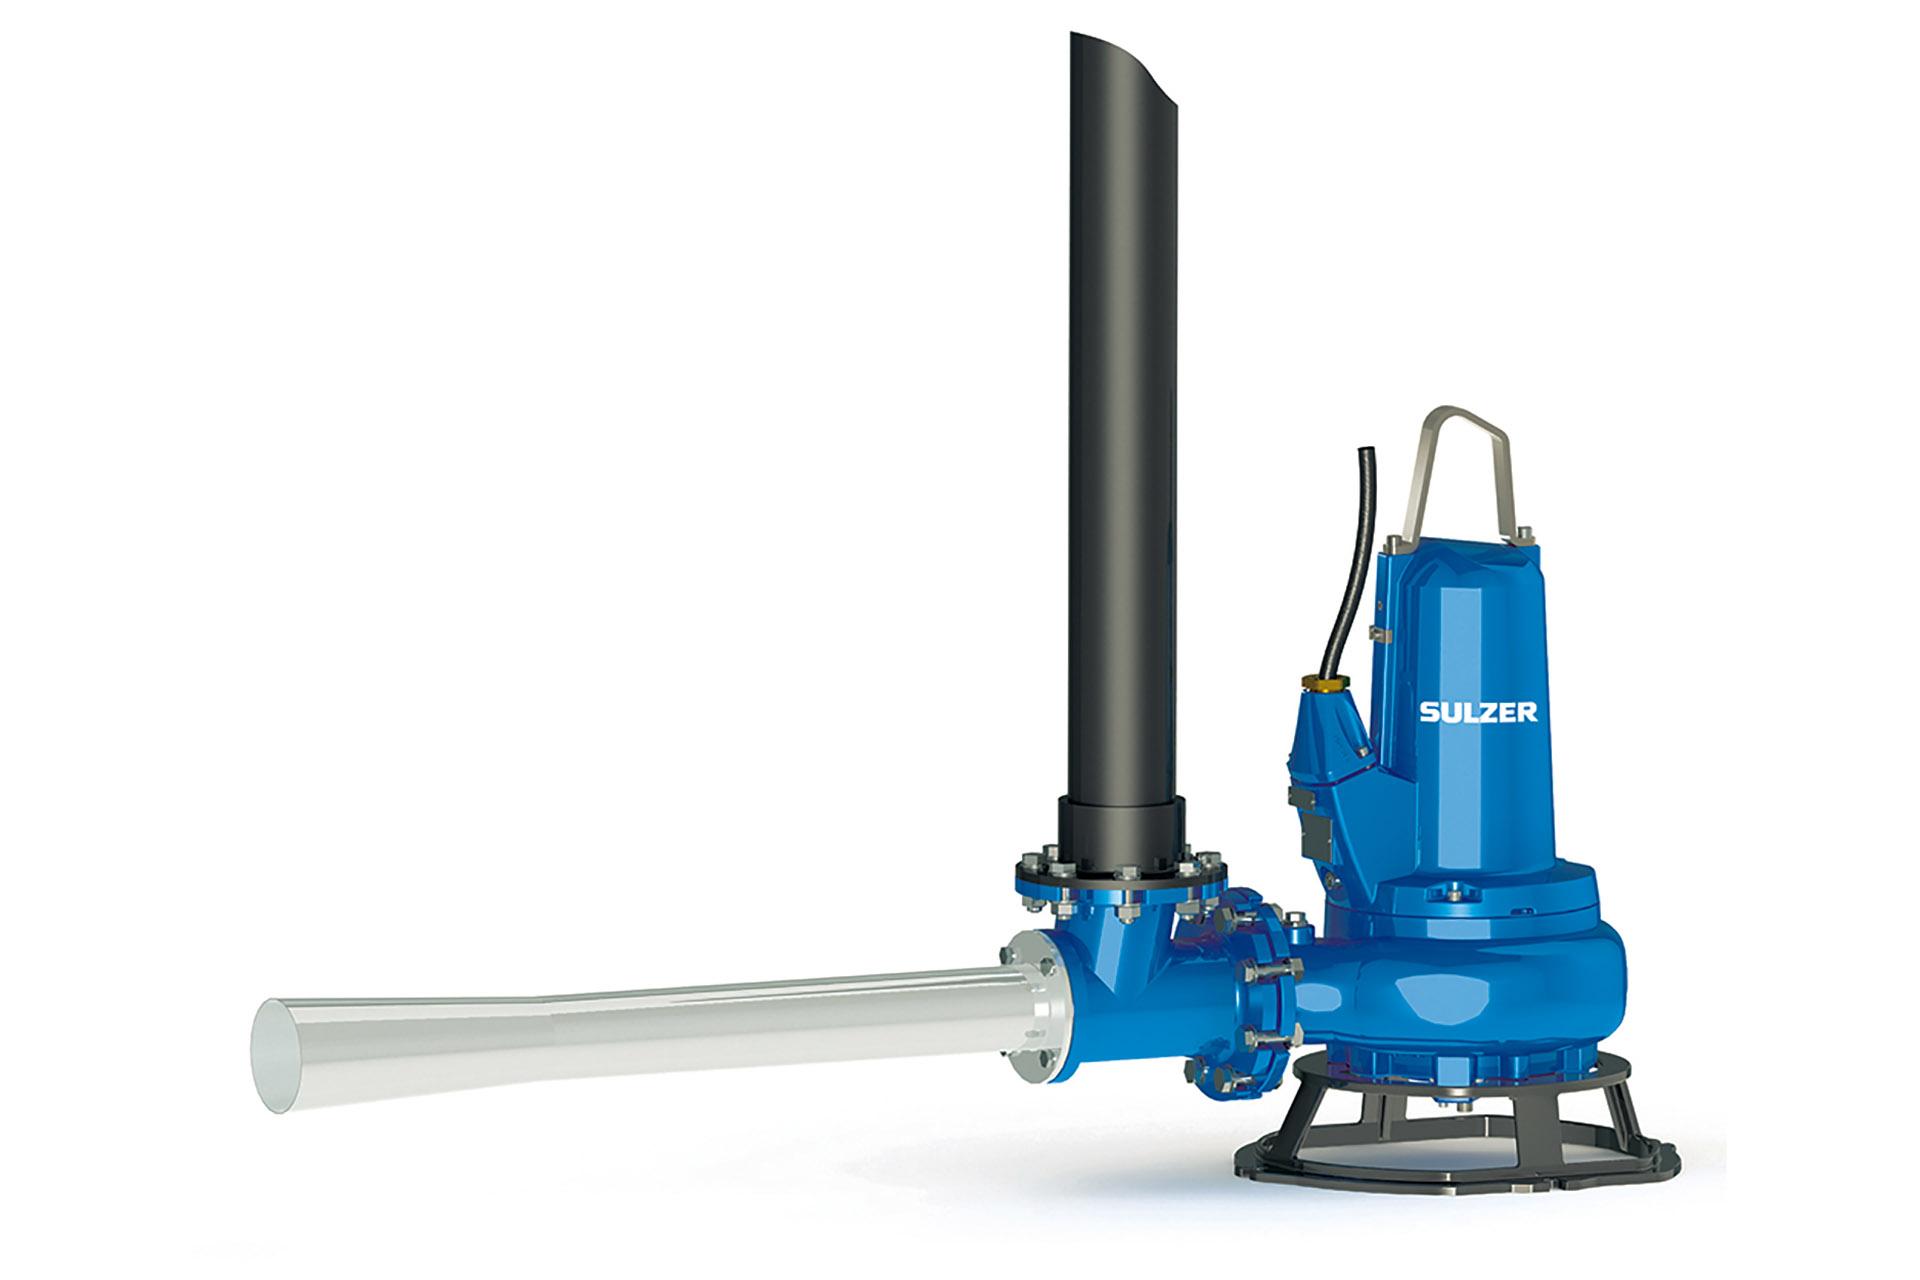 Aerator type abs venturi jet sulzer for Jet septic aerator motor